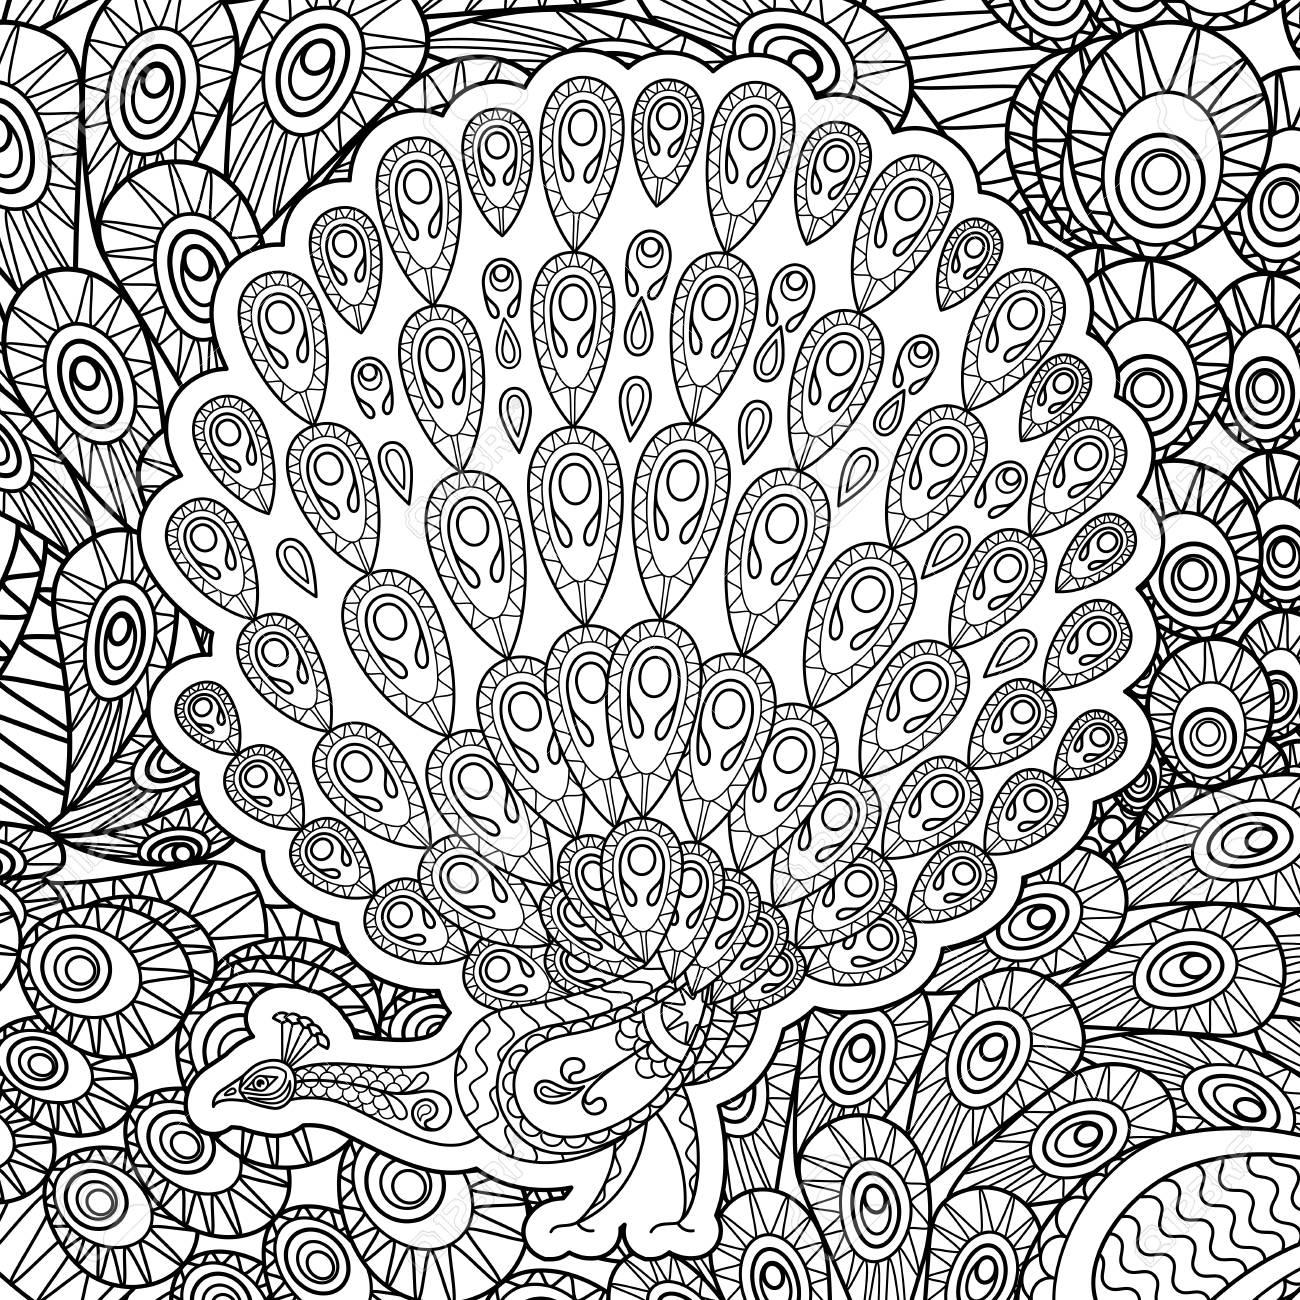 Ausmalbilder Erwachsene Pfau Anti Stress Coloring Book Beautiful